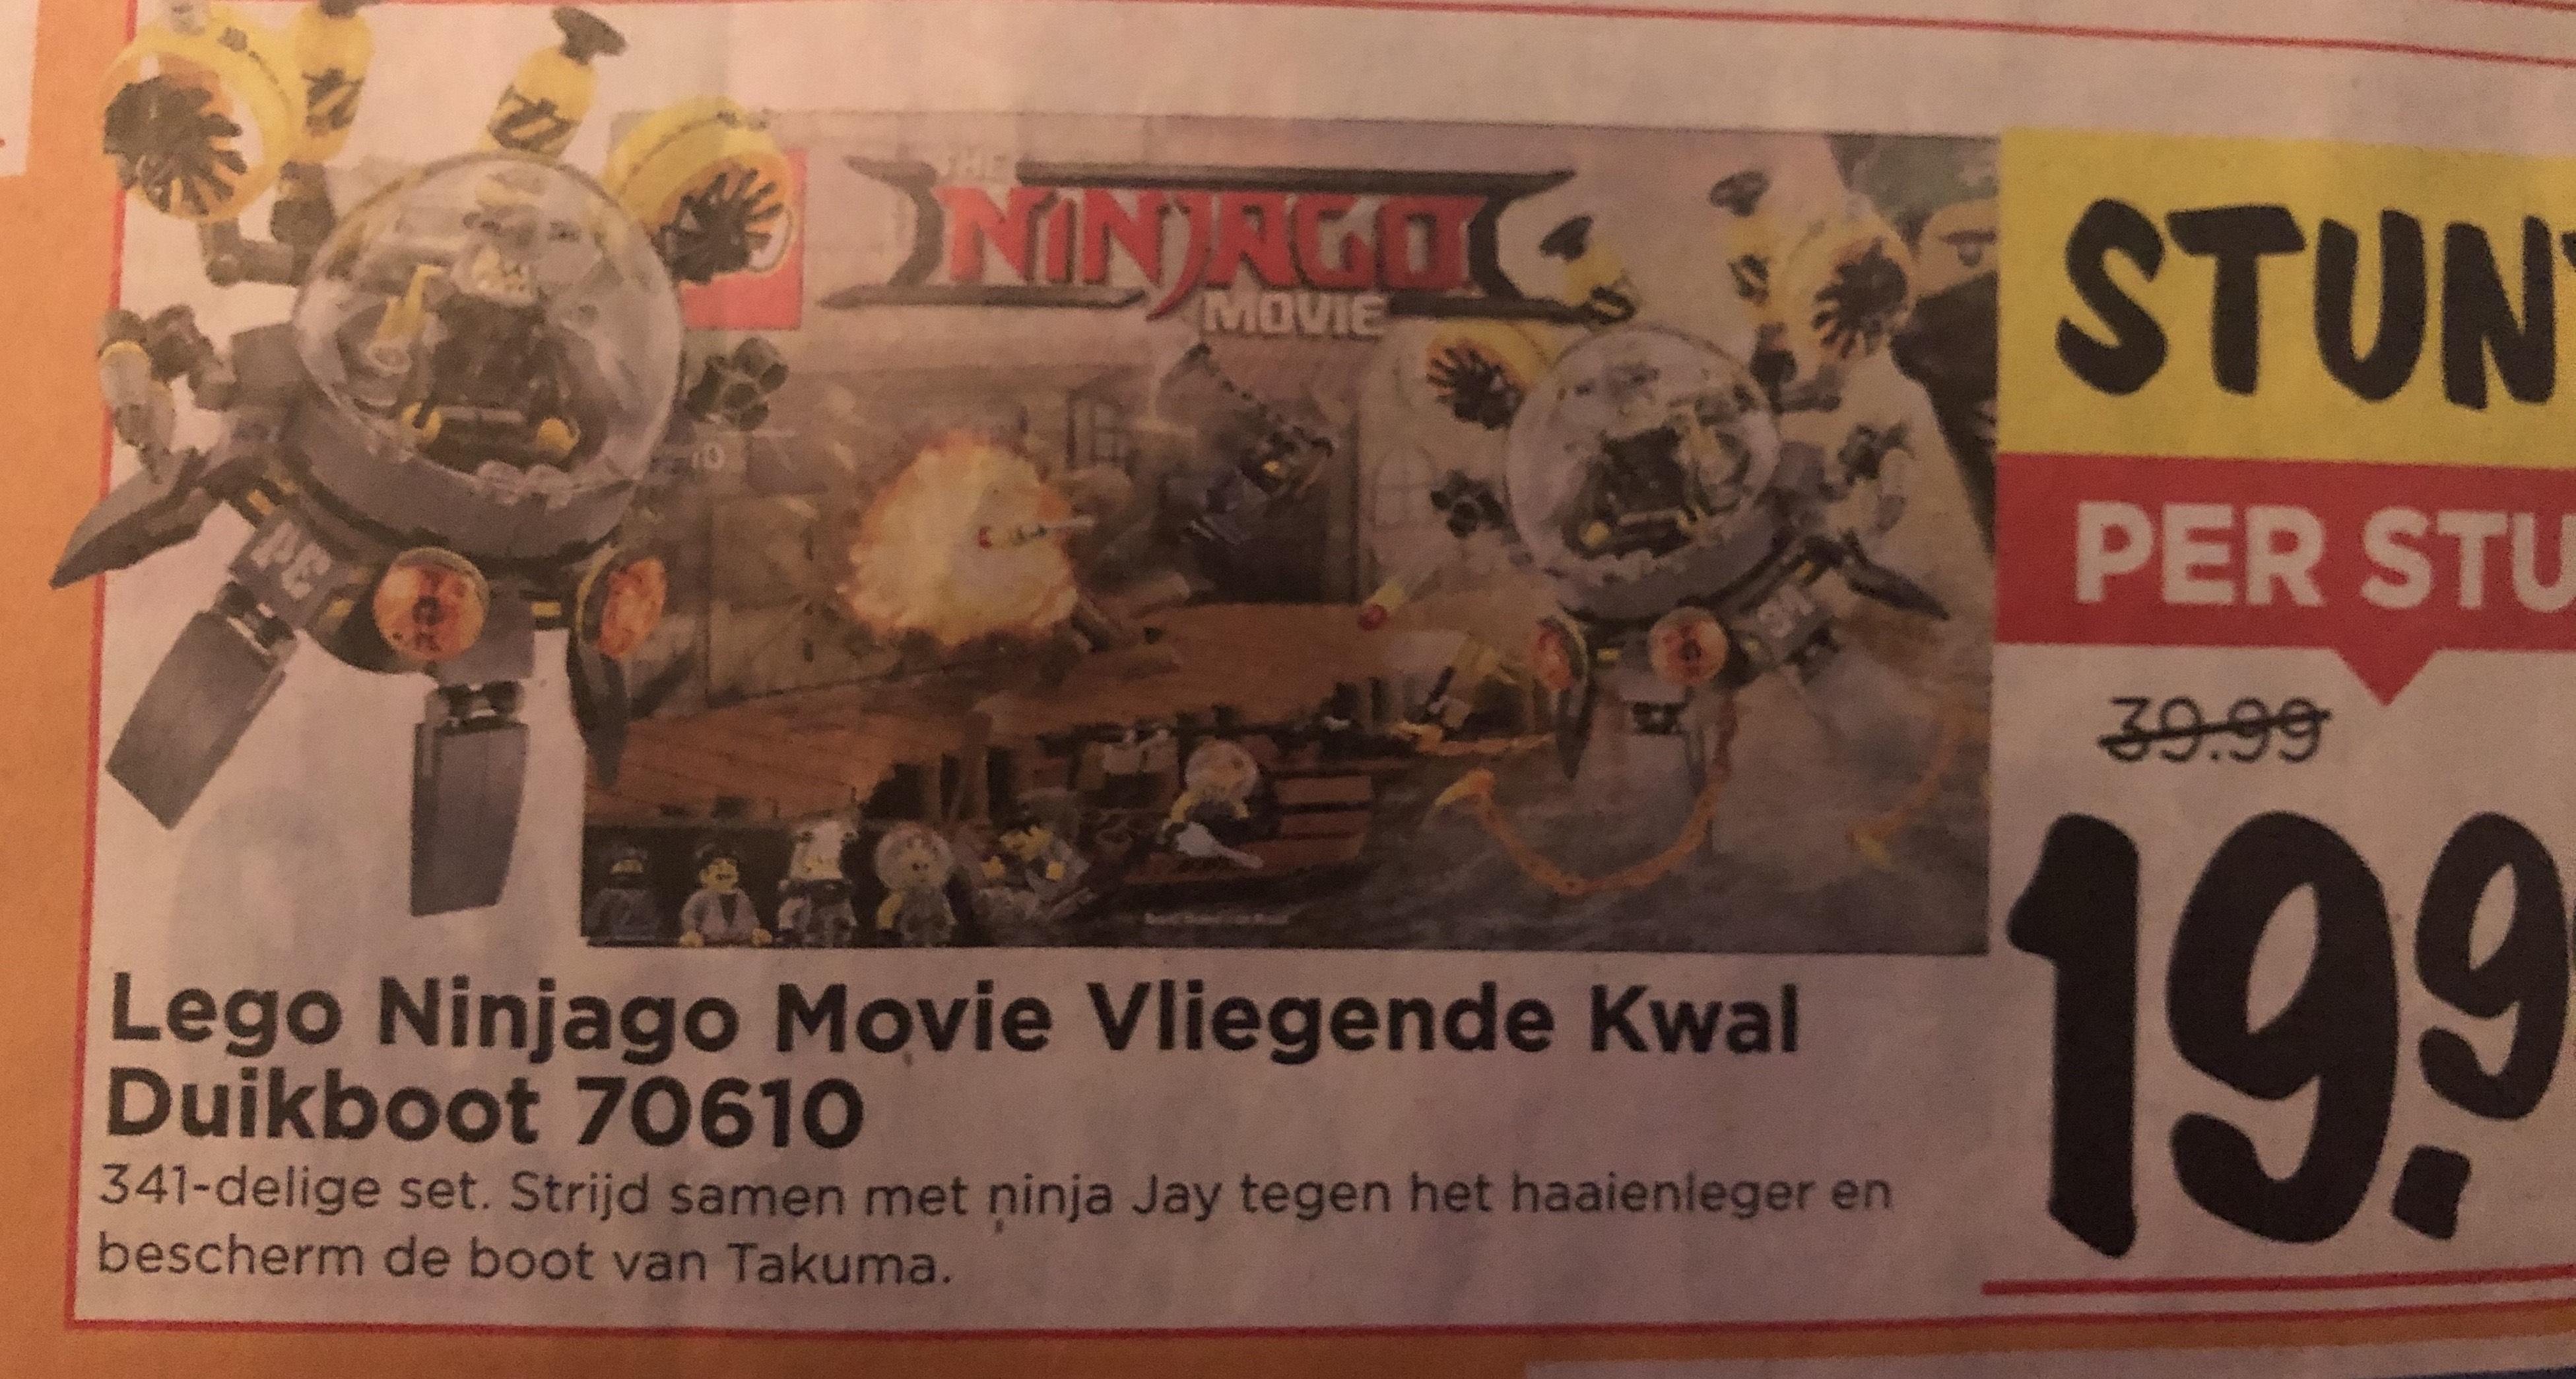 (VOMAR) 40% korting! LEGO Ninjago movie vliegende kwal 70610